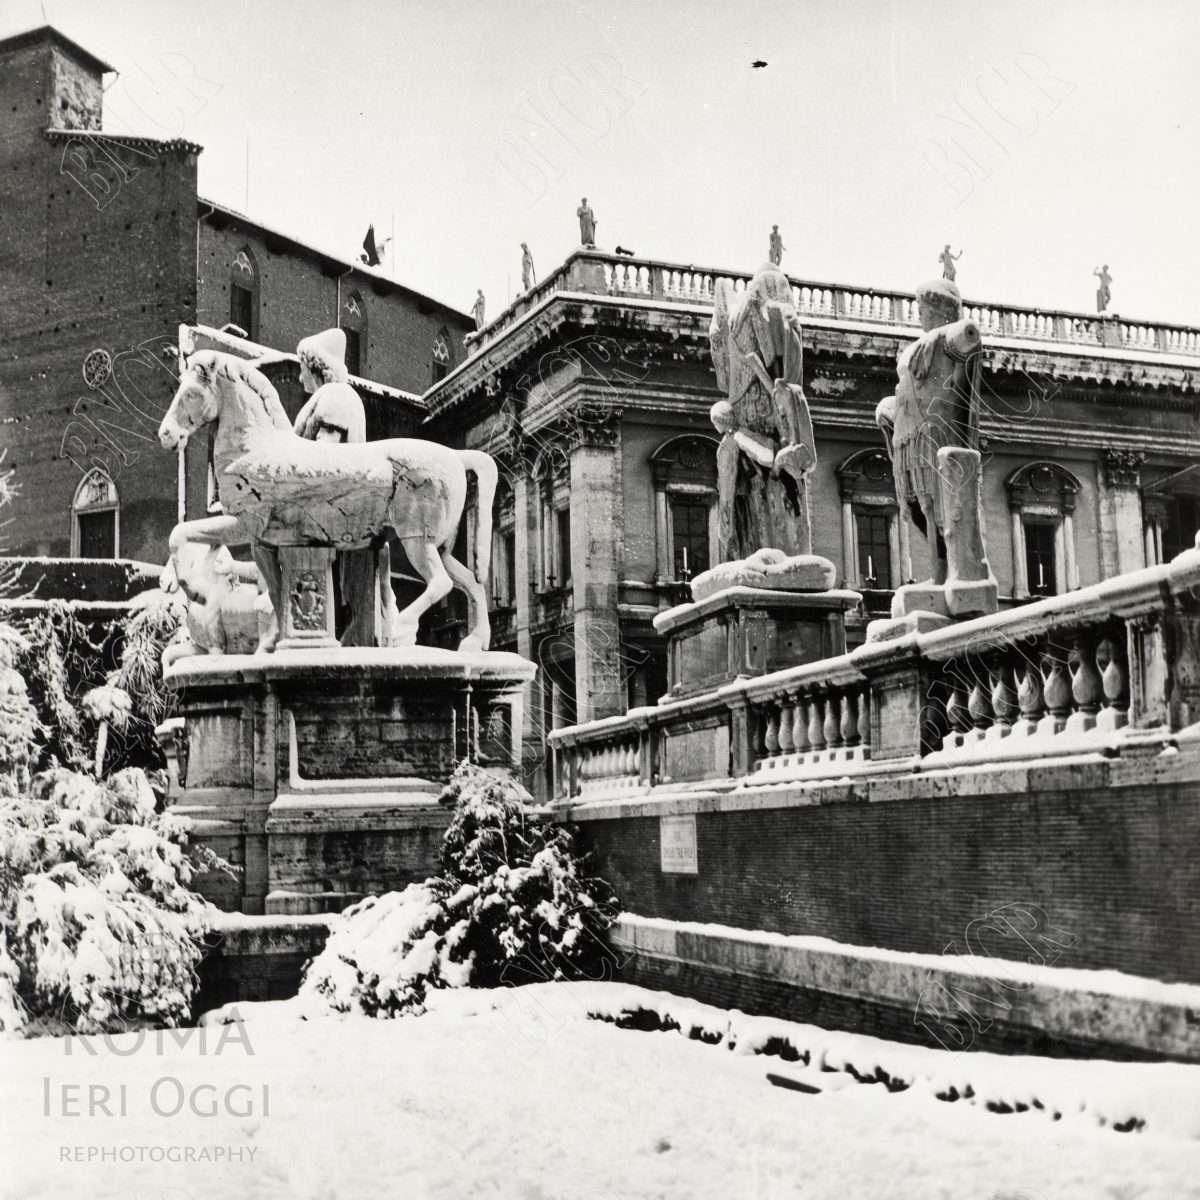 Sotto La neve 1965 Campidoglio